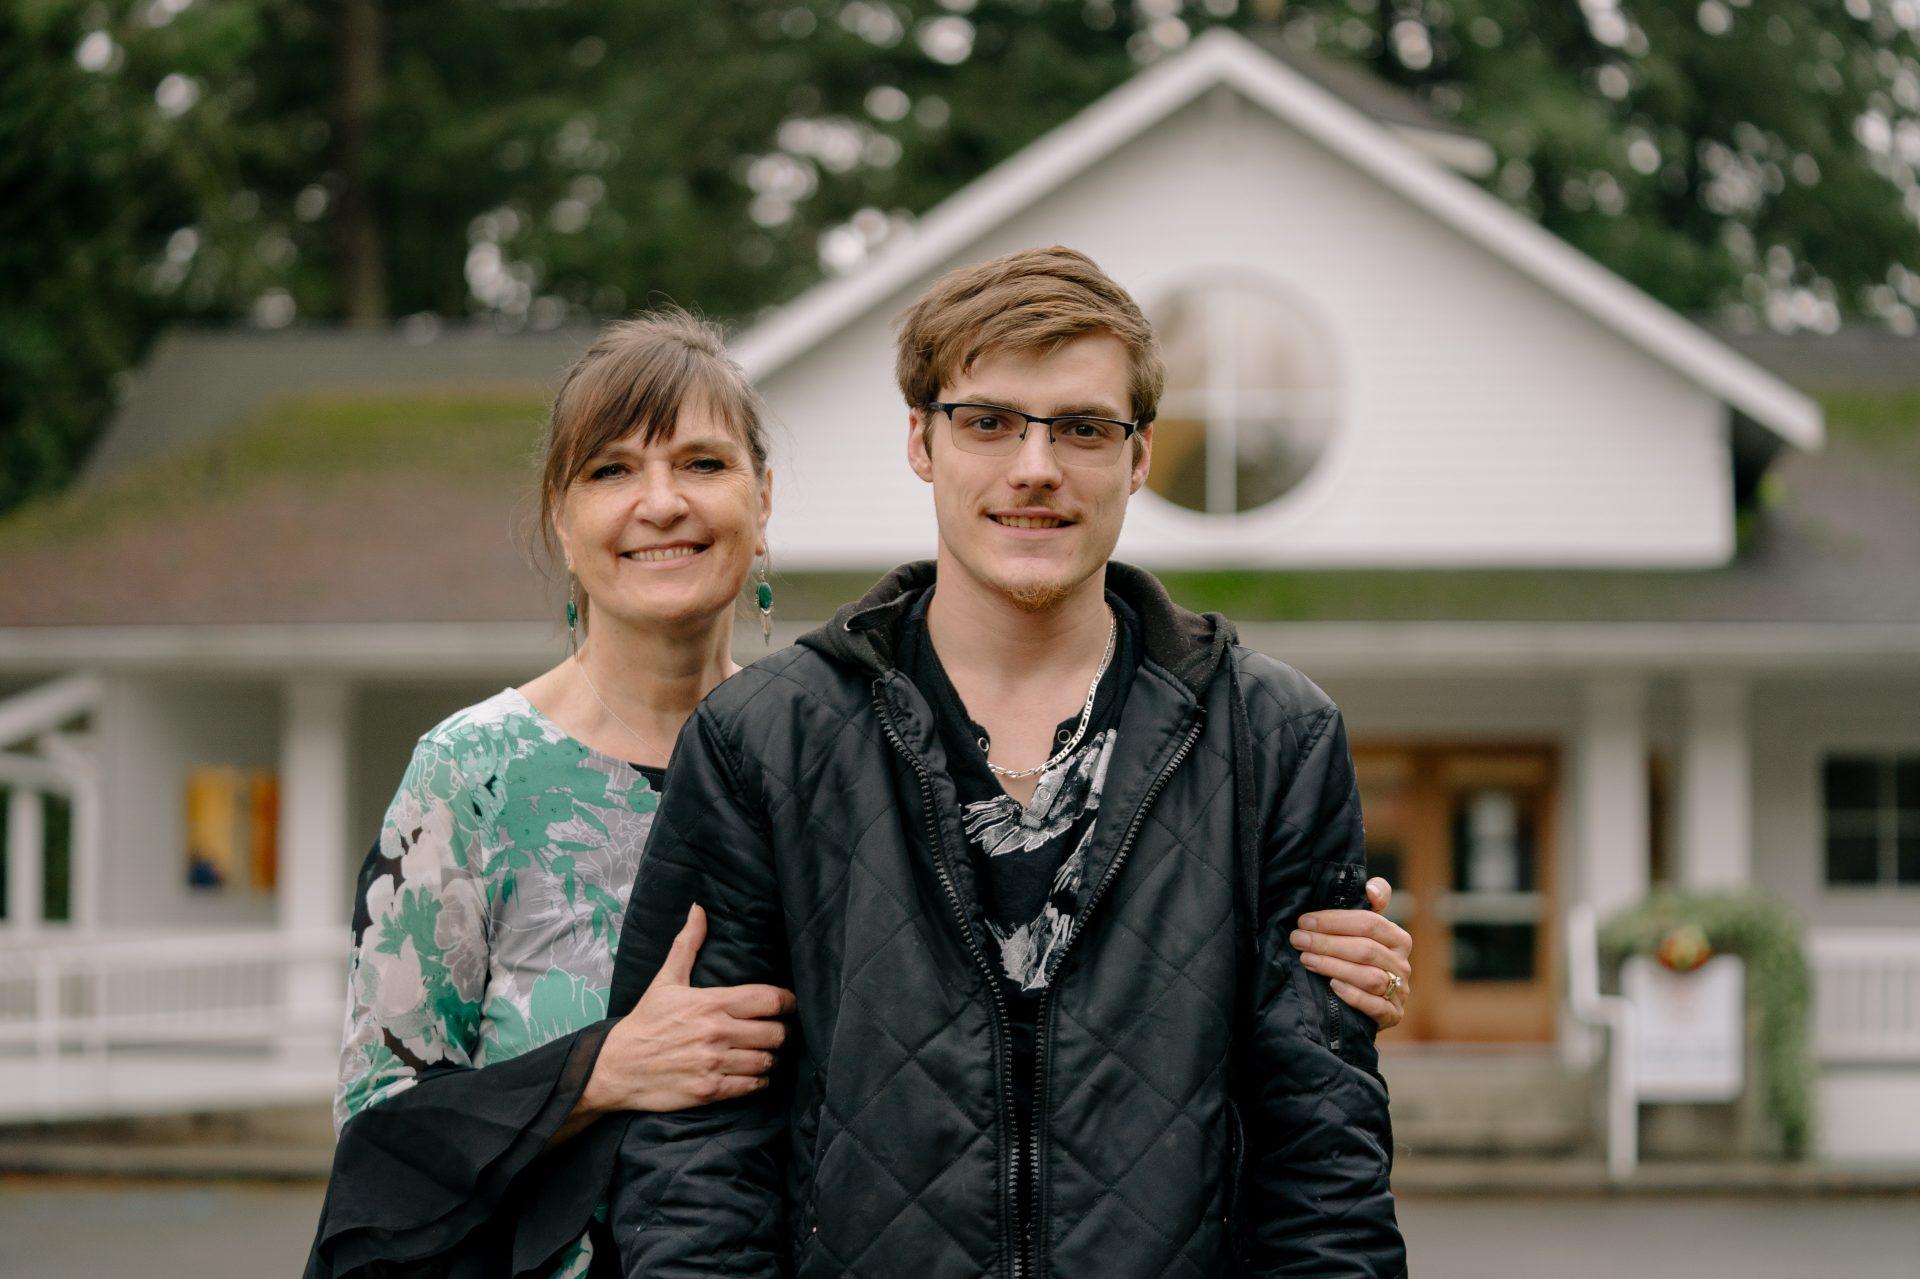 Henriët Schapelhouman and her son, Harrison Schapelhouman, outside True Hope Community Church in Issaquah, Wash.